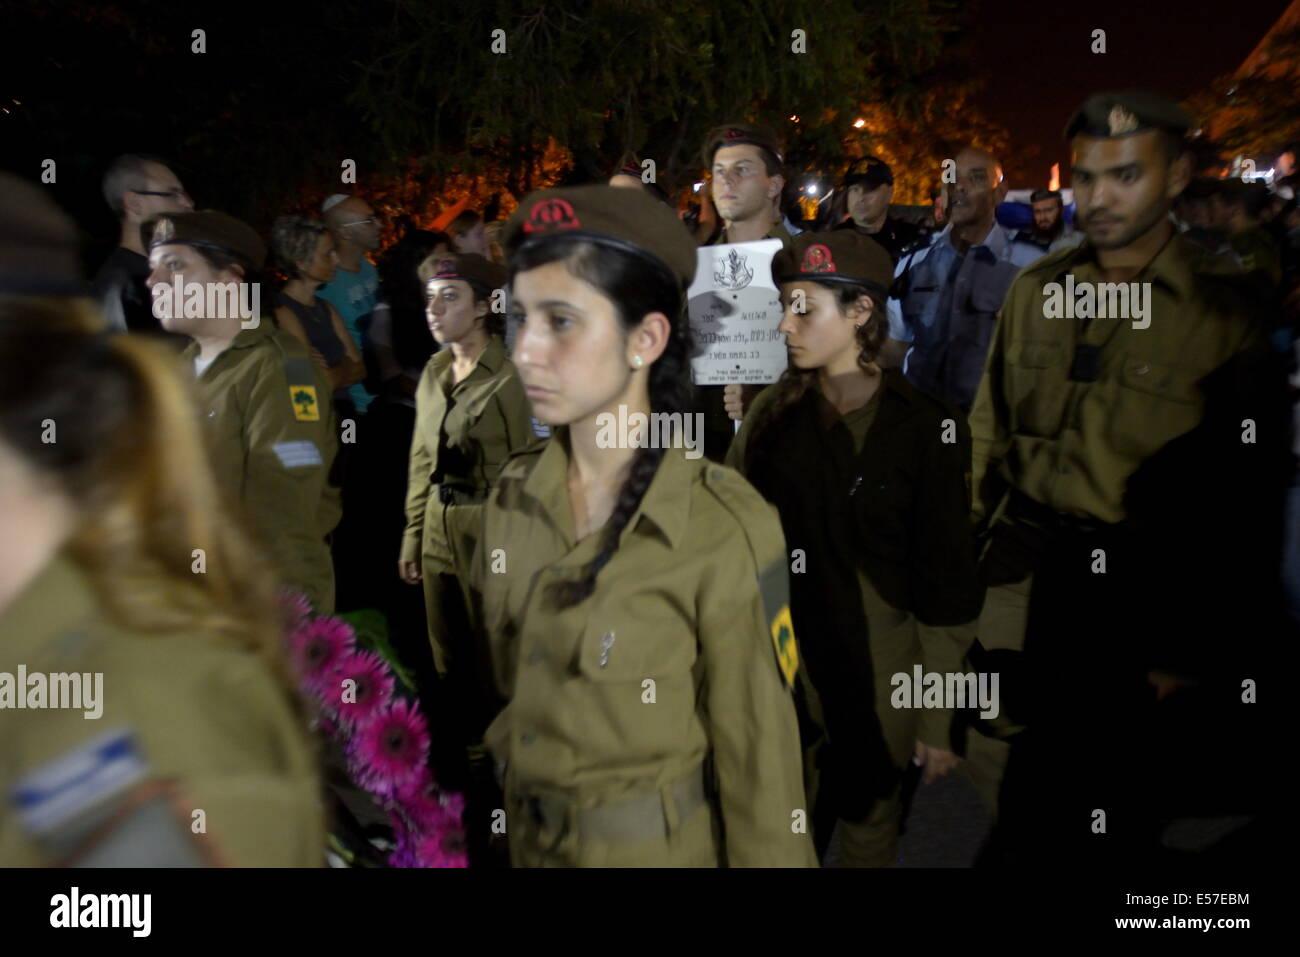 Haifa, Israel. 21st July, 2014. HAIFA, ISRAEL - JULY 21, 2014: Some dozens of thousands of Israelis attended the - Stock Image